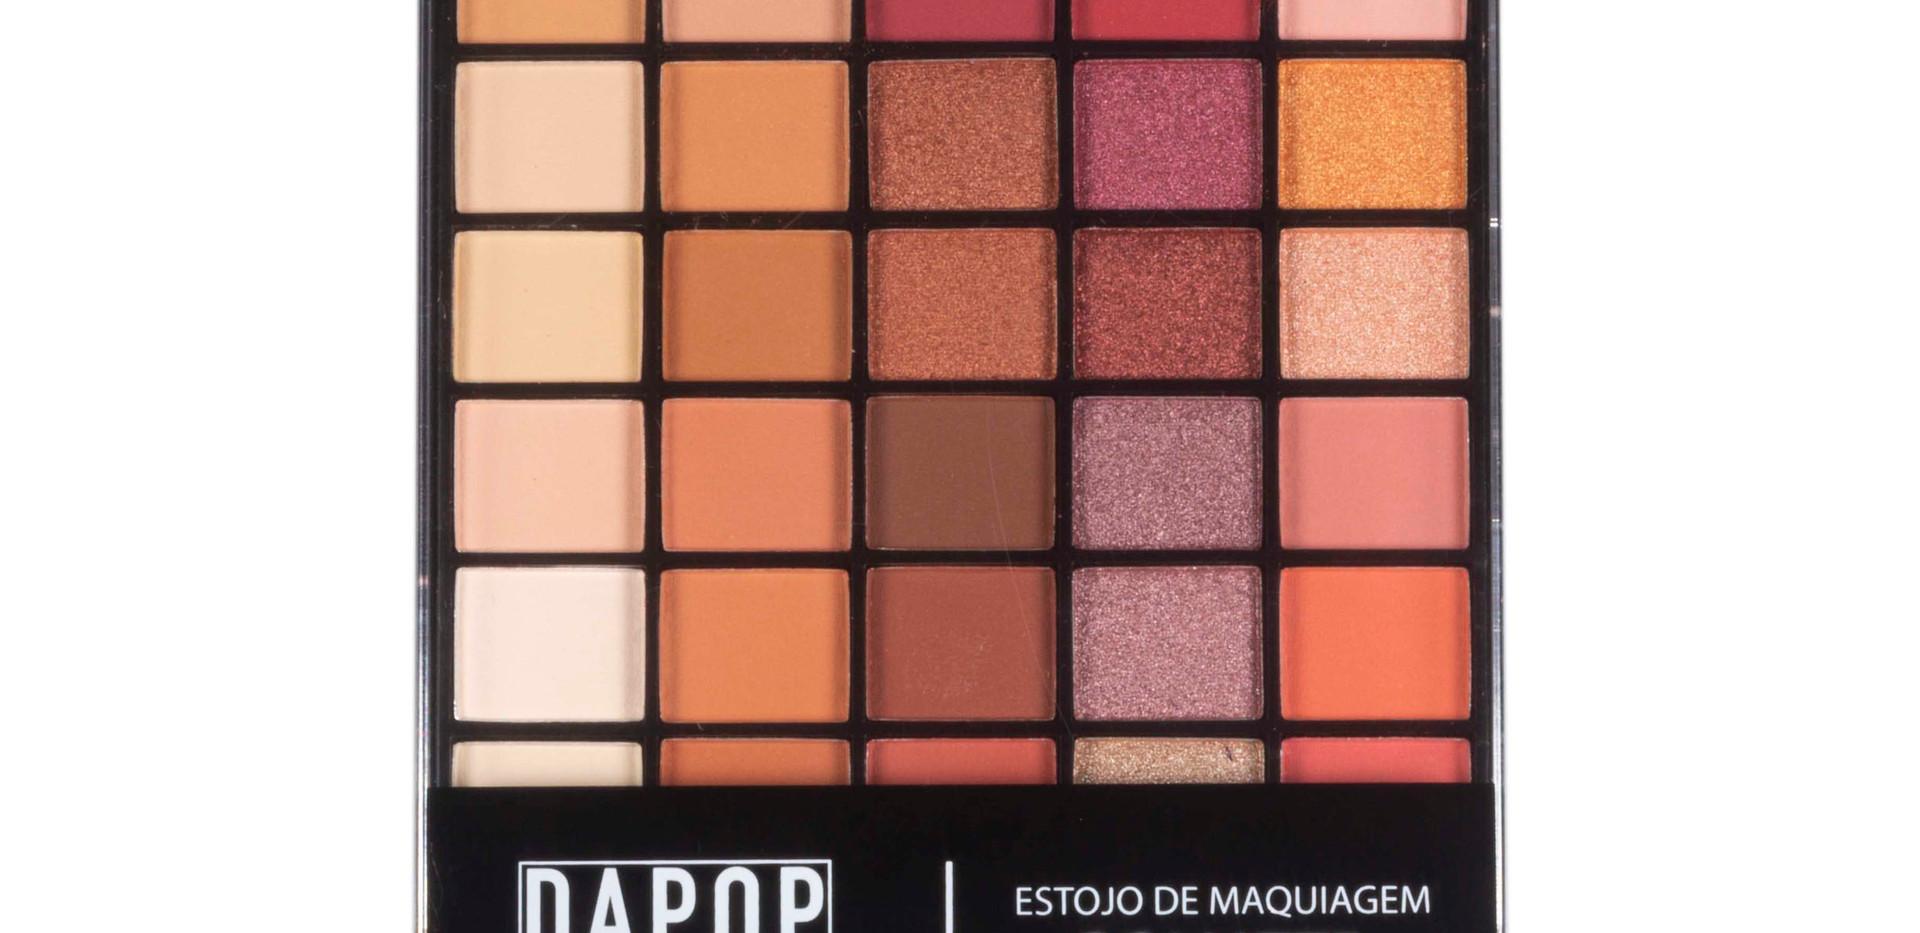 Paleta de Sombras 30 Cores Dapop - HB96777